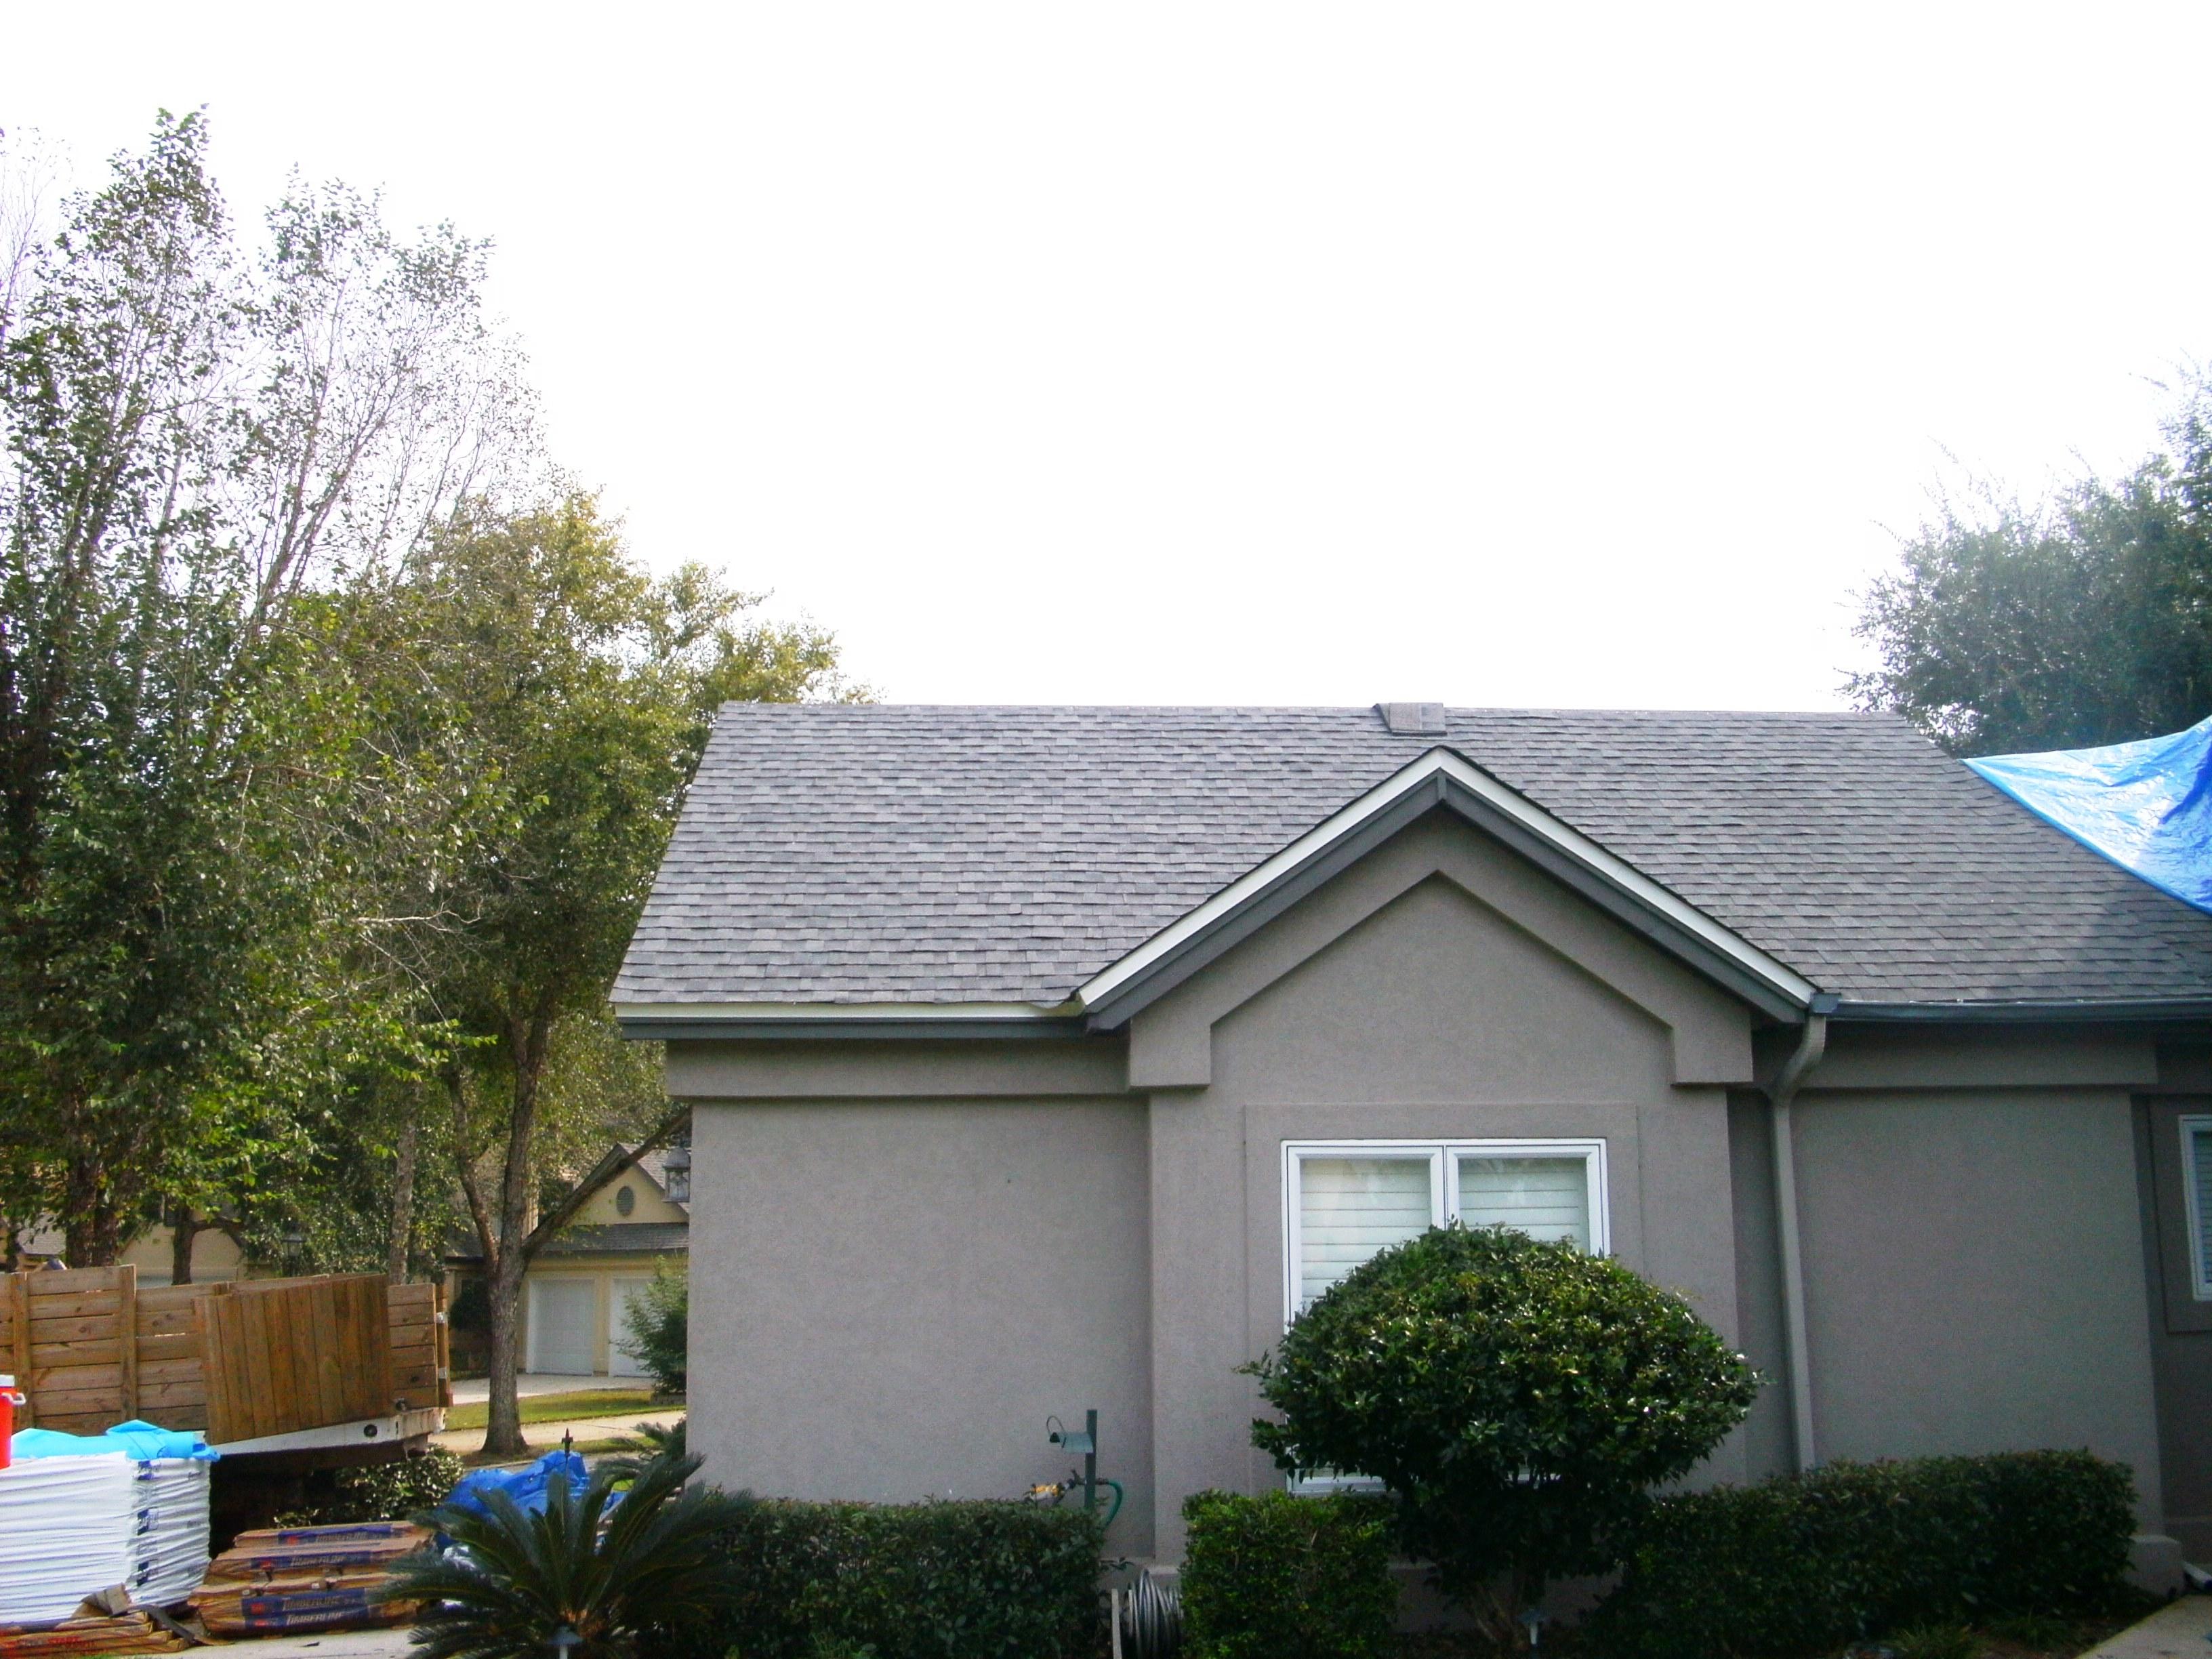 Elite Pro Roofing Llc Robertsdale Al 36567 Angies List